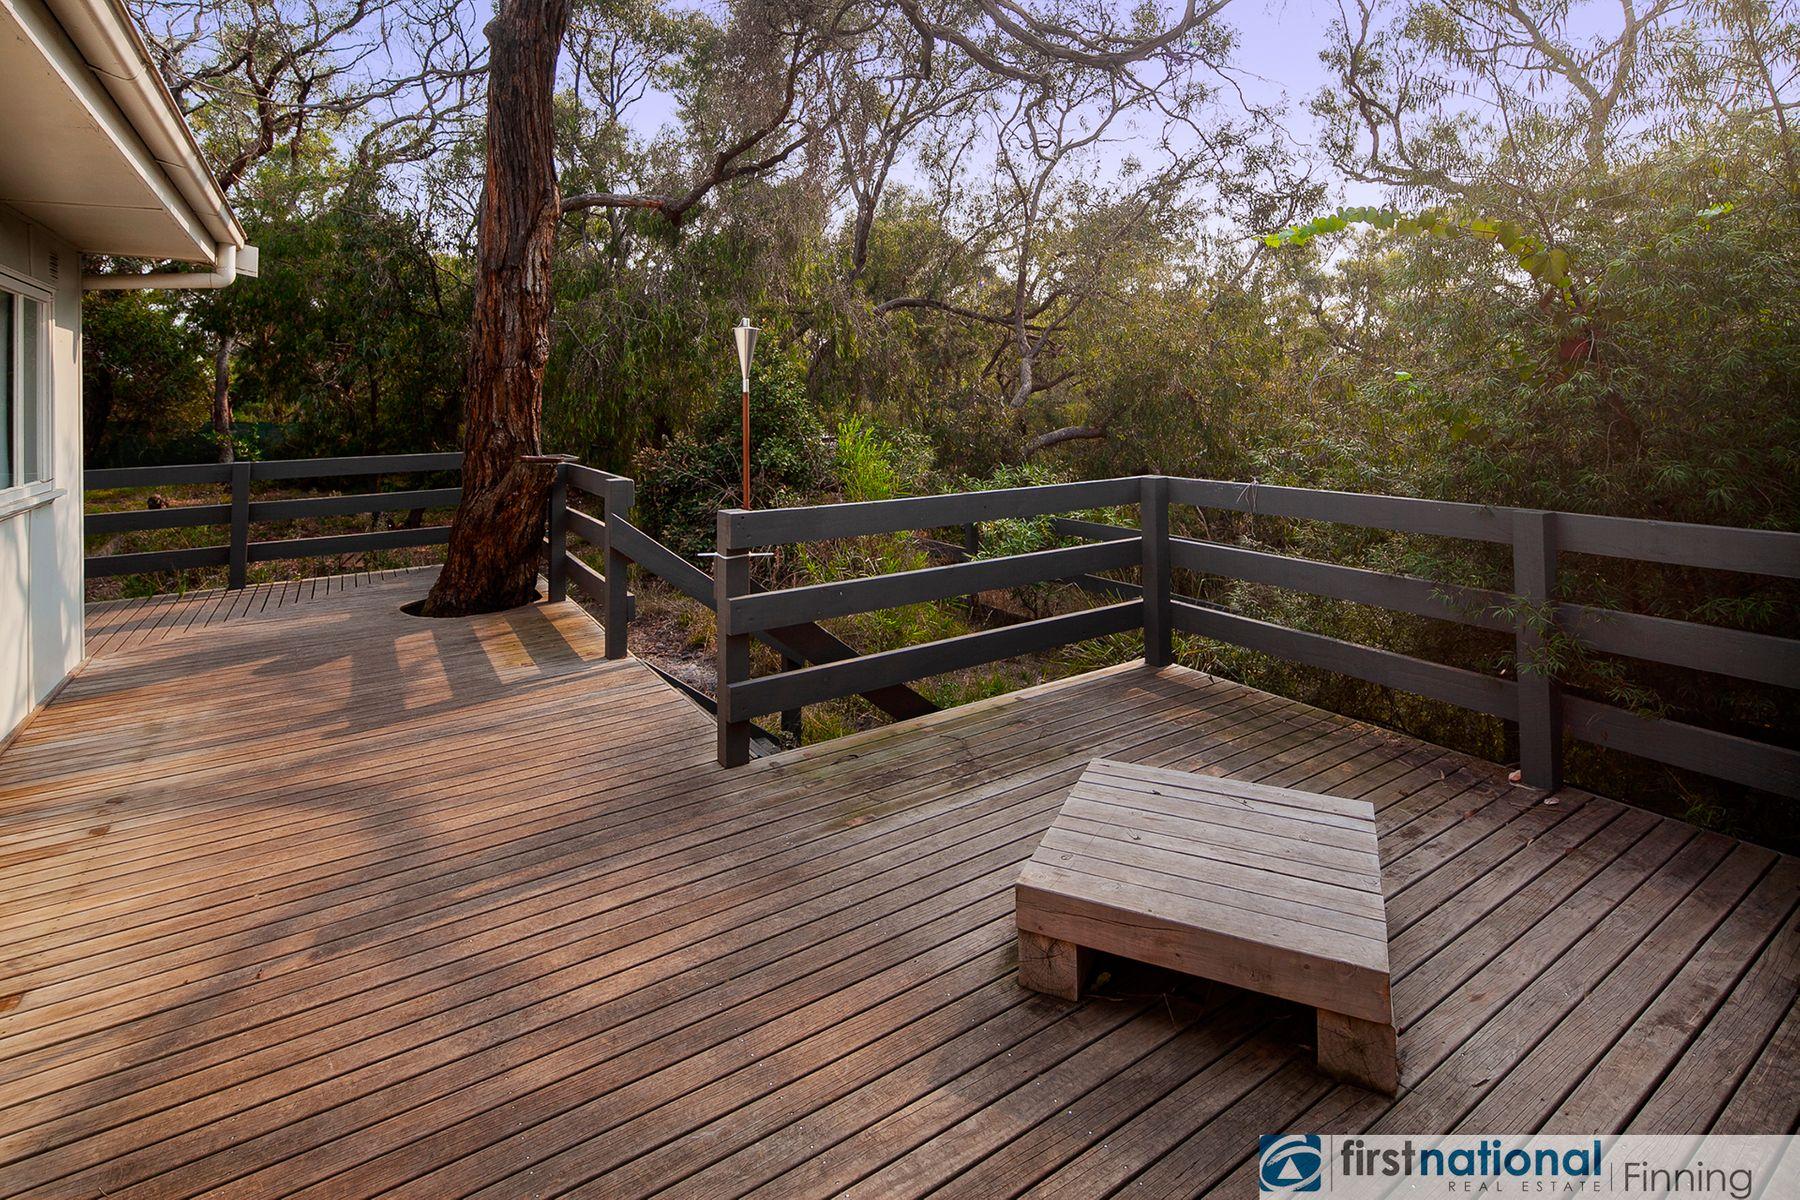 2 Edgewater Terrace, Warneet, VIC 3980